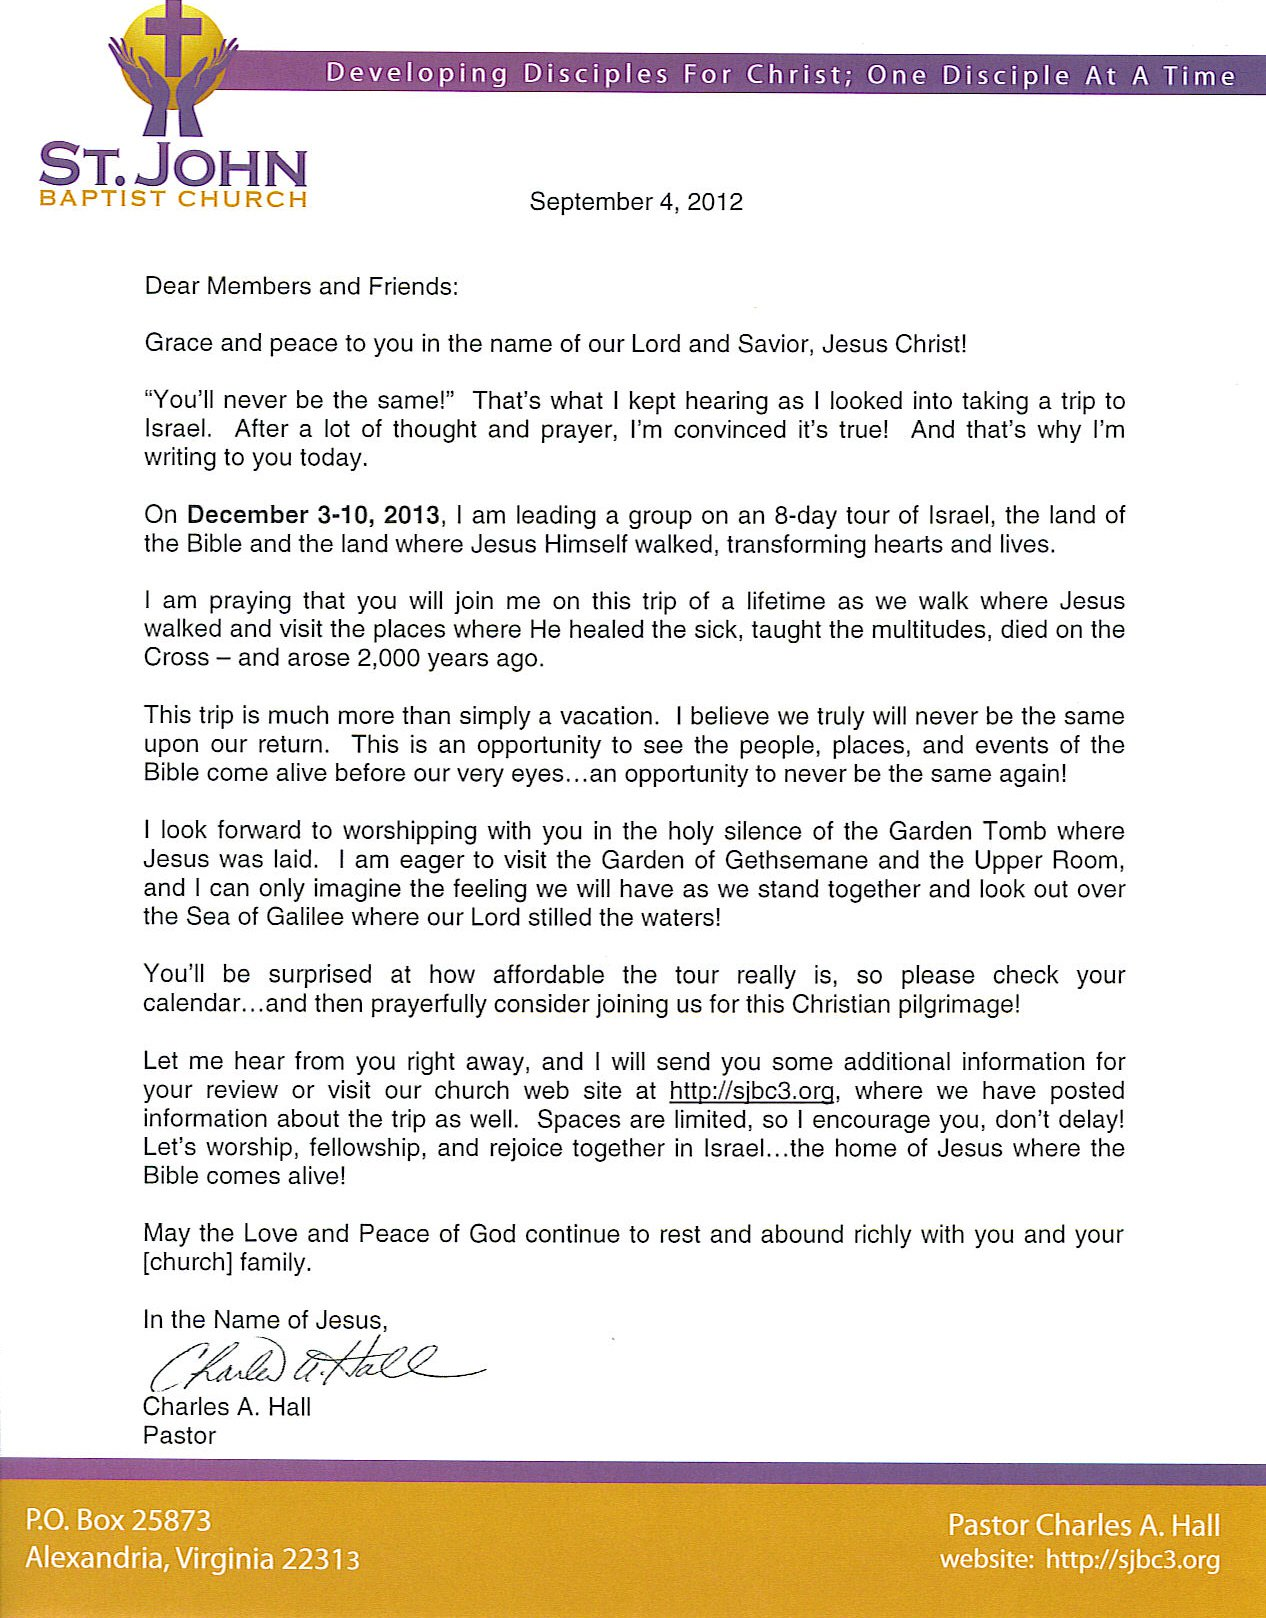 Invitation letter sample for engagement resume pdf download invitation letter sample for engagement sample invitation letter business letter writing guide 1266 x 1618 560 stopboris Images